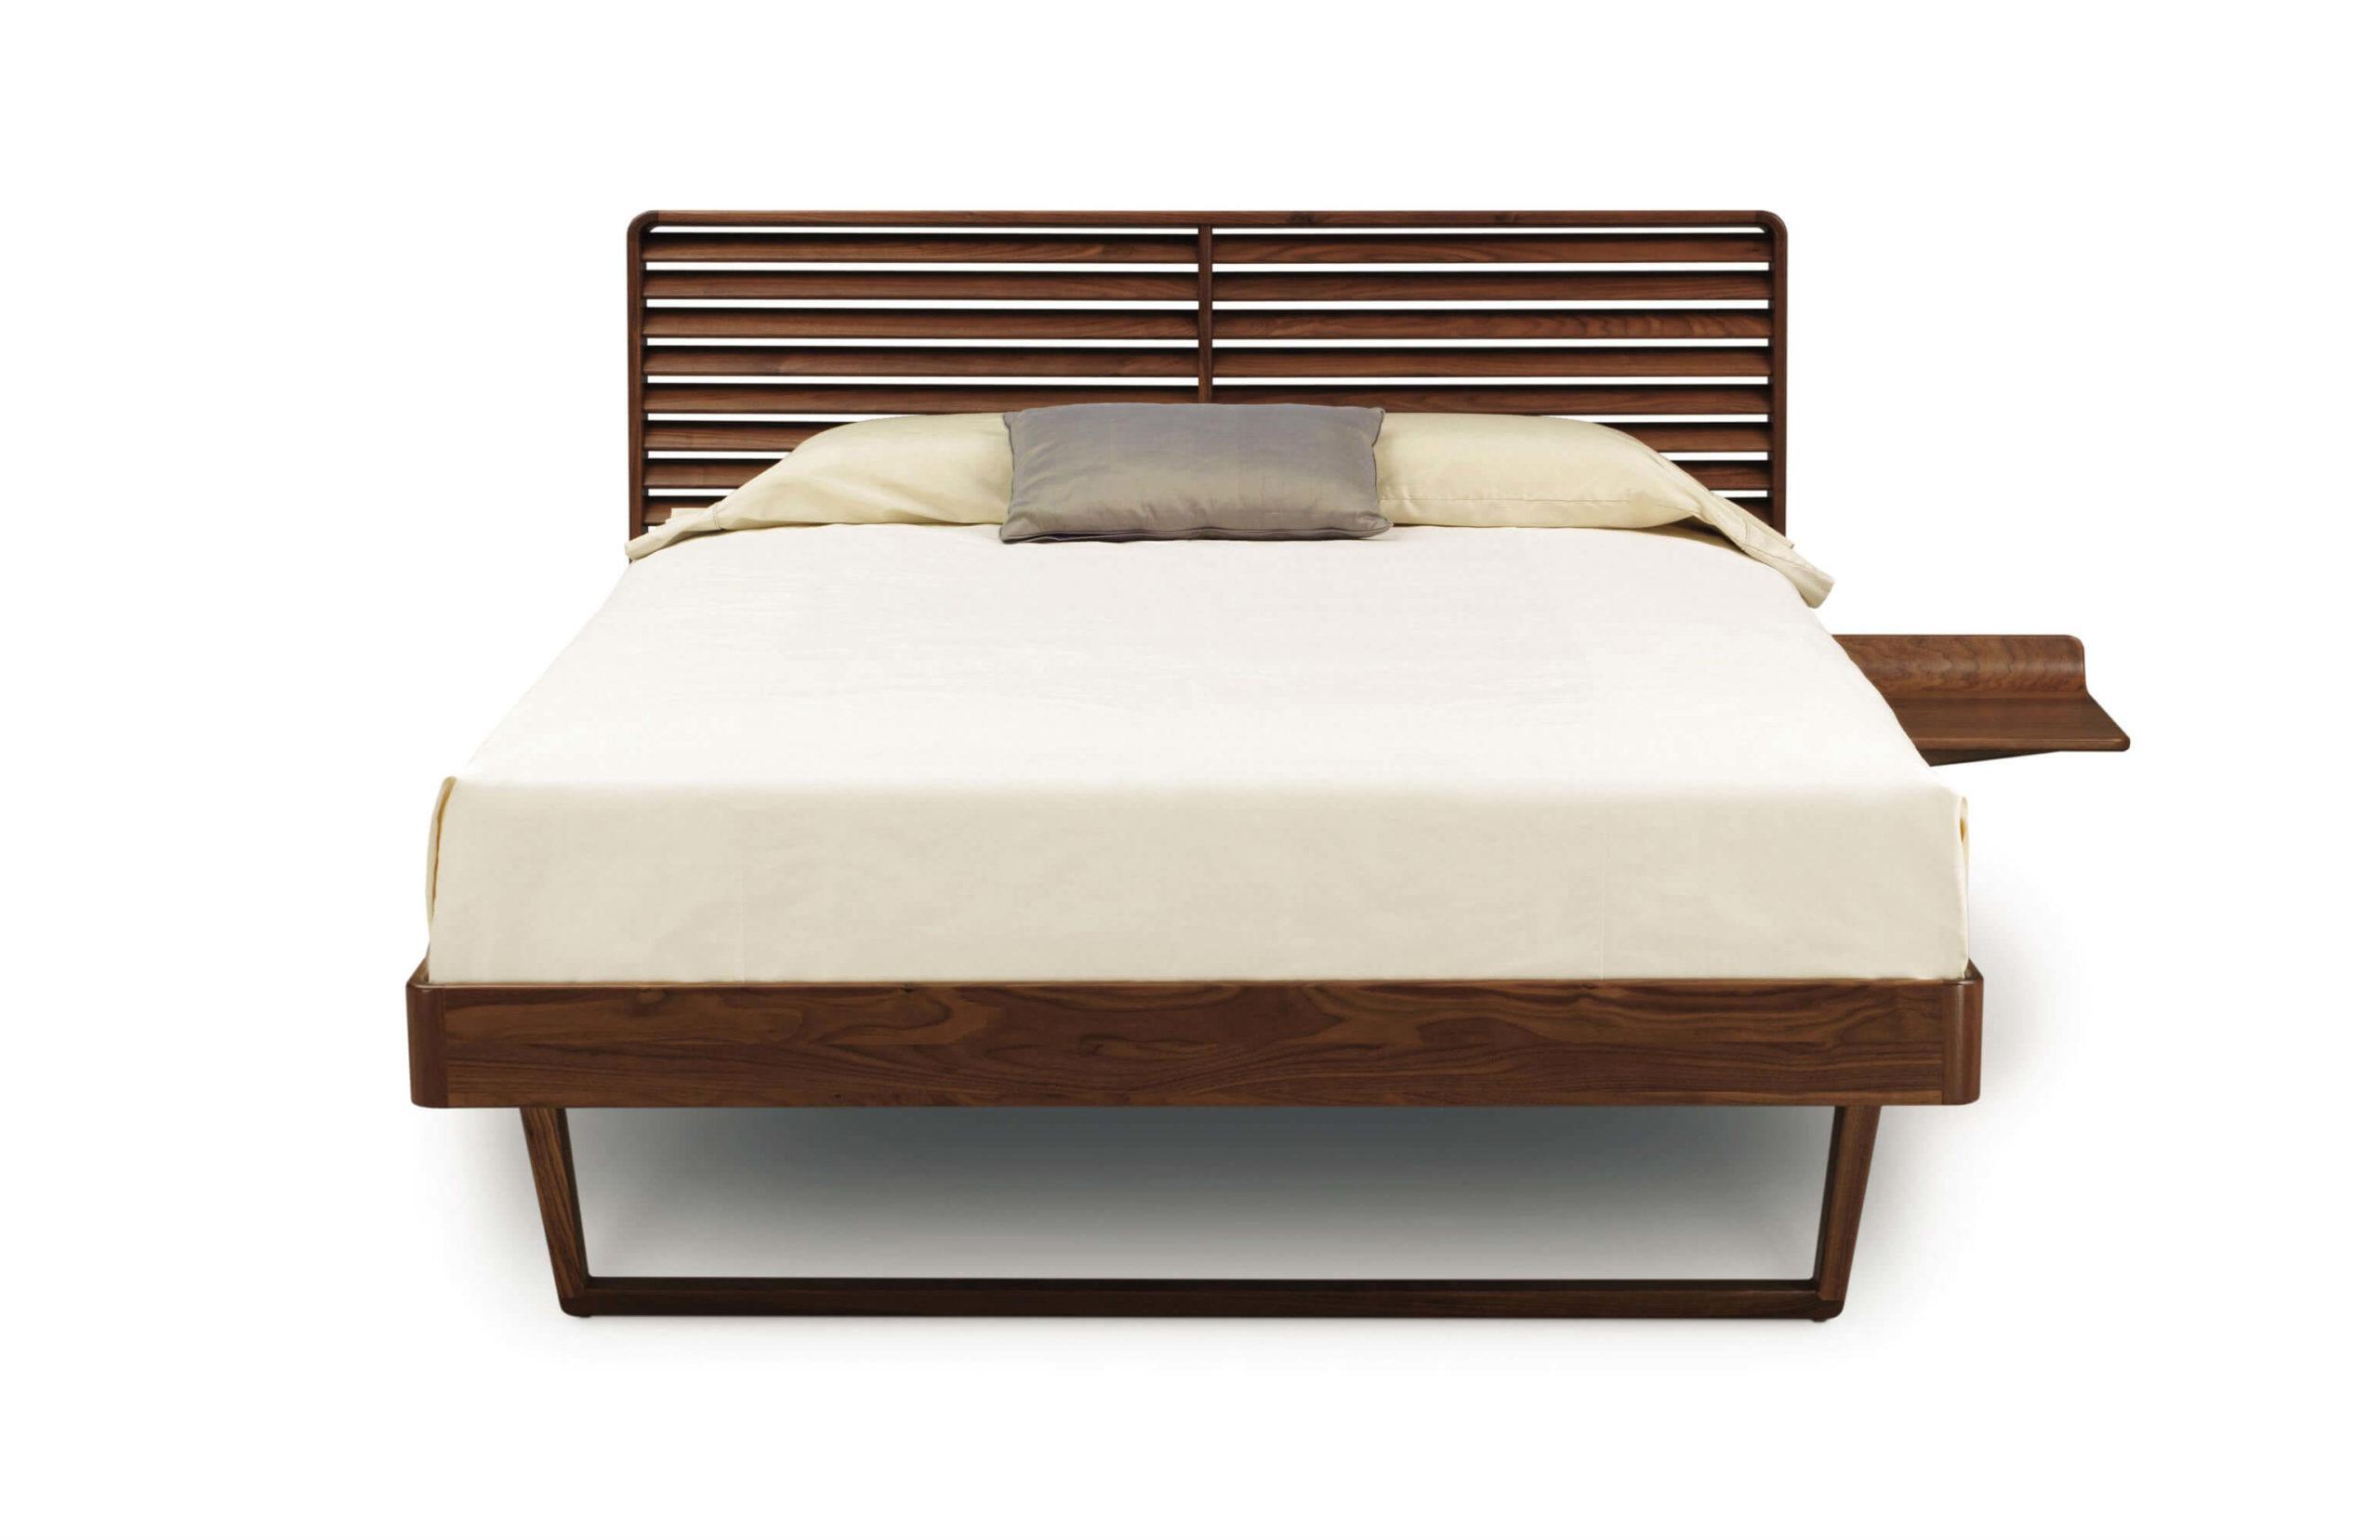 B&M Copeland Contour Bed